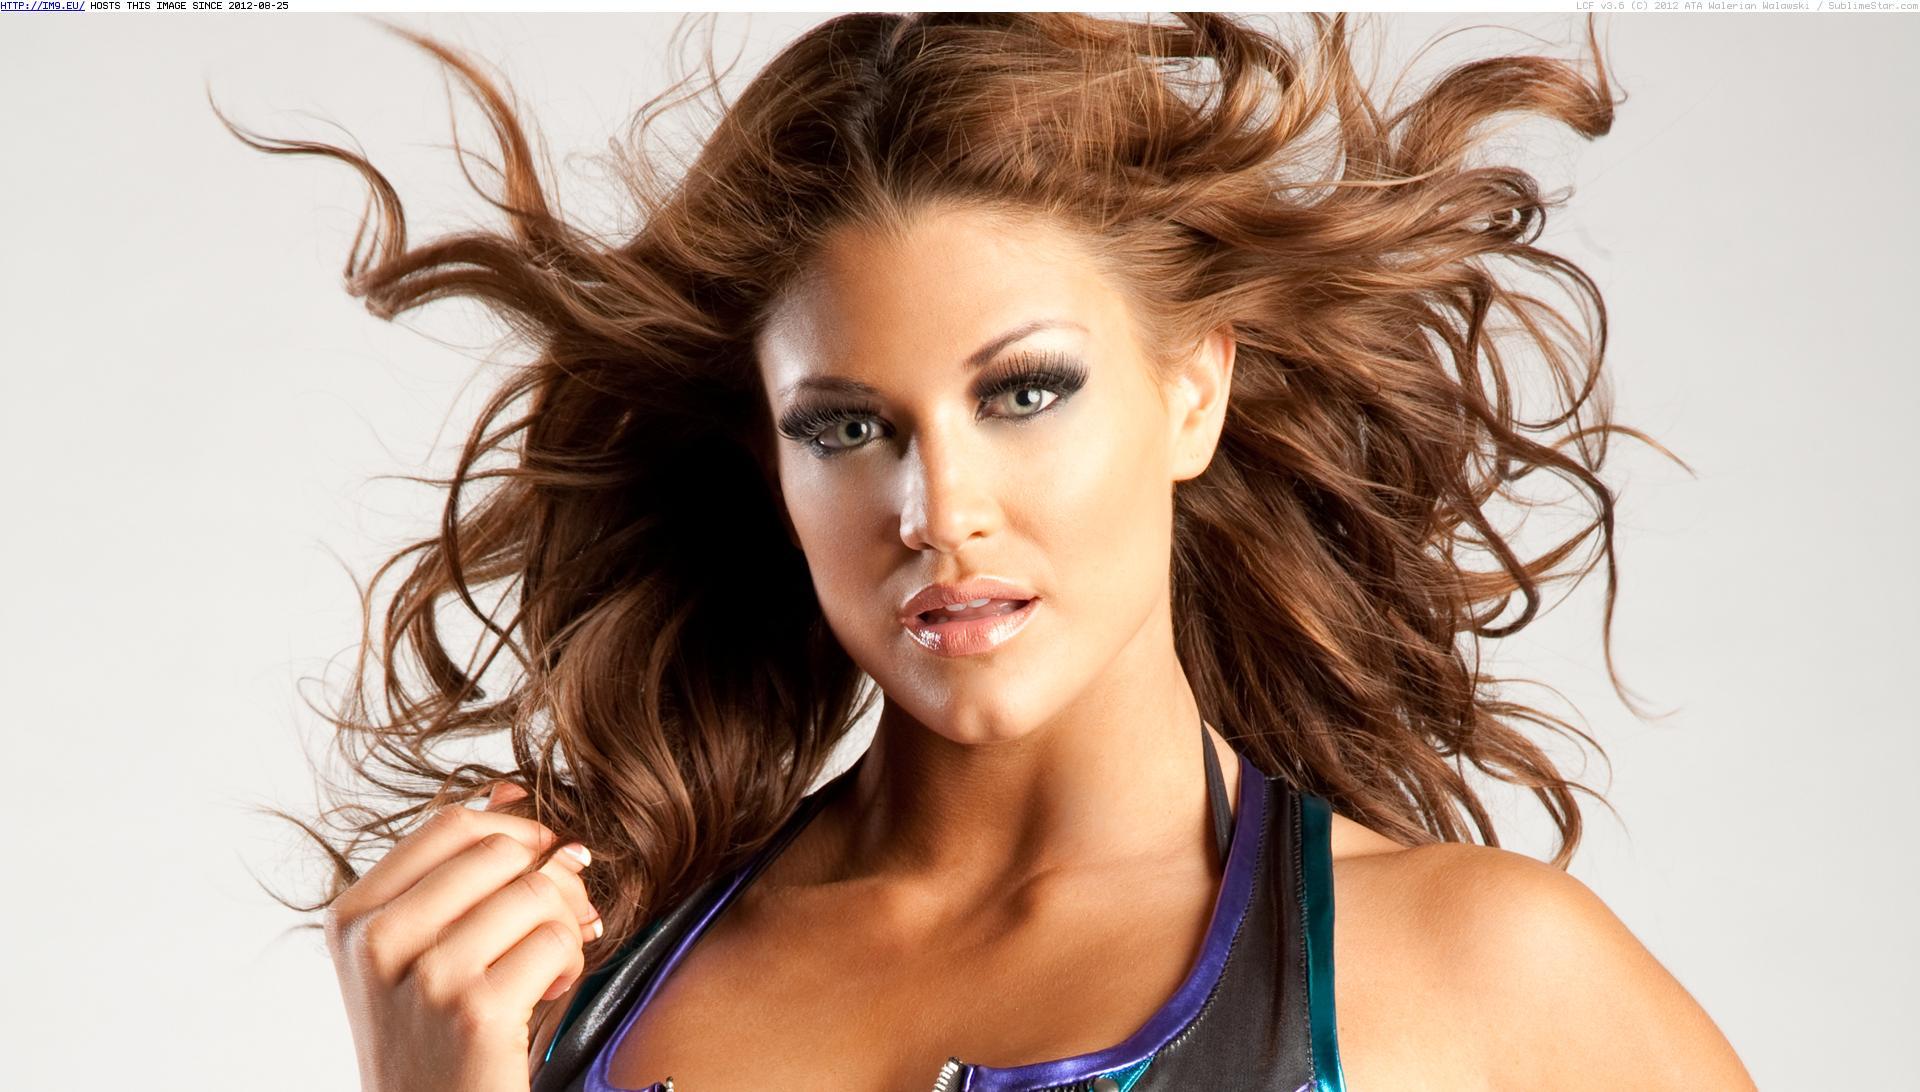 WWE Super Hot Divas Full HD Wallpapers Eve Torres wallpaper 7 1920x1092